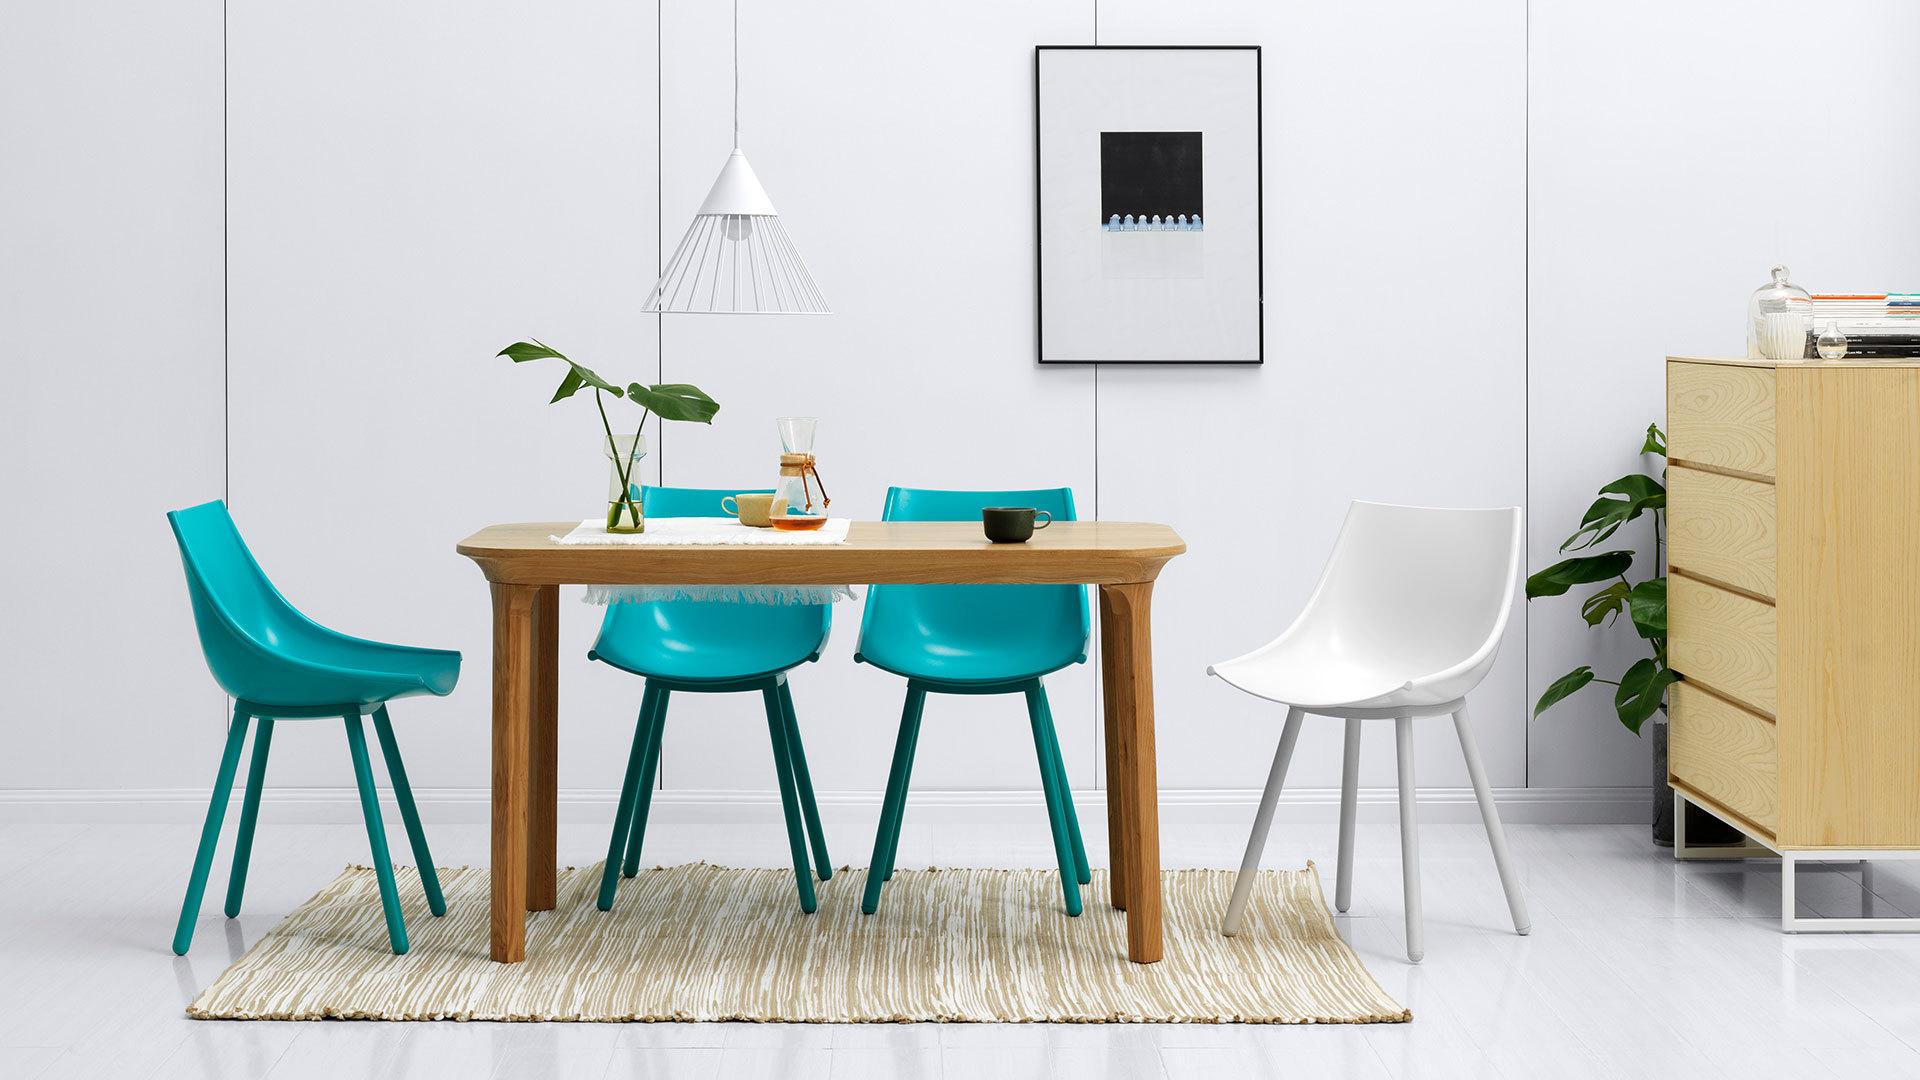 瓦檐餐桌 | Tab Series